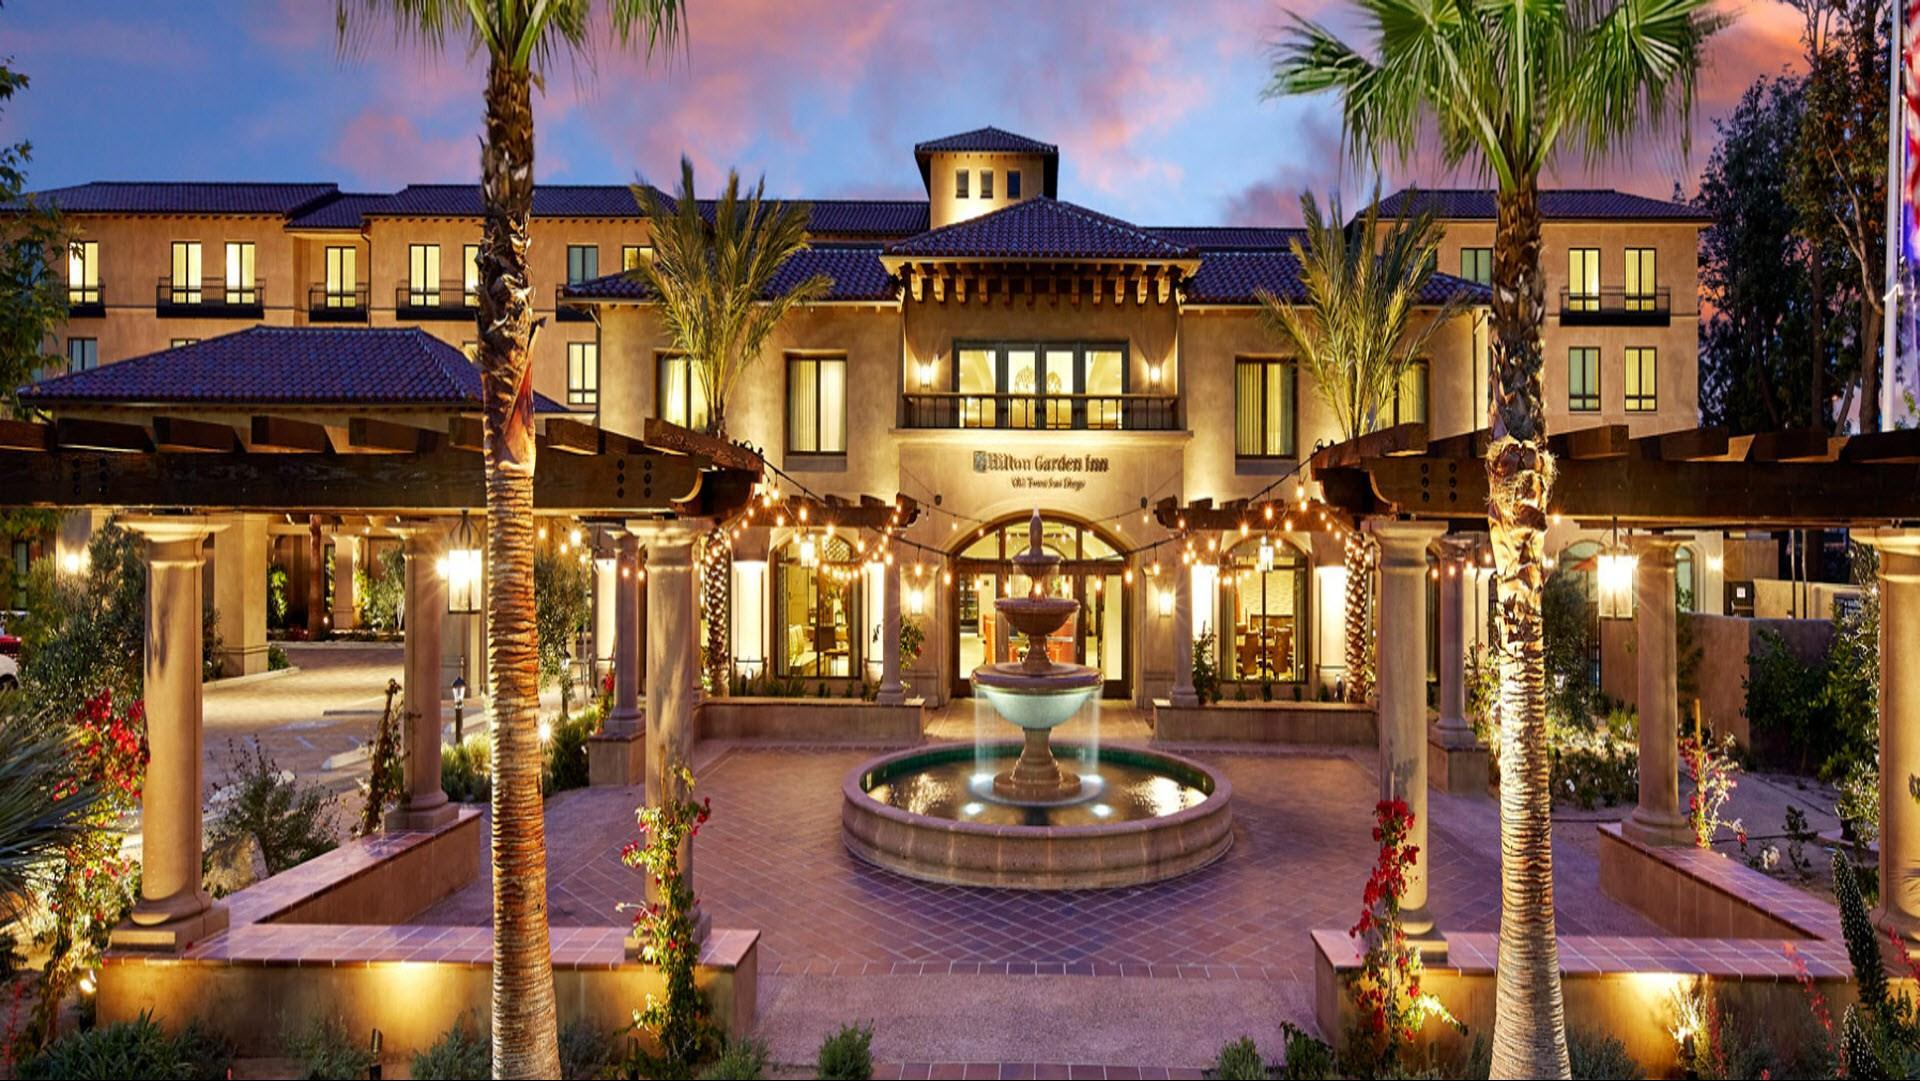 hilton garden inn san diego old townseaworld area - Hilton Garden Inn San Diego Old Town